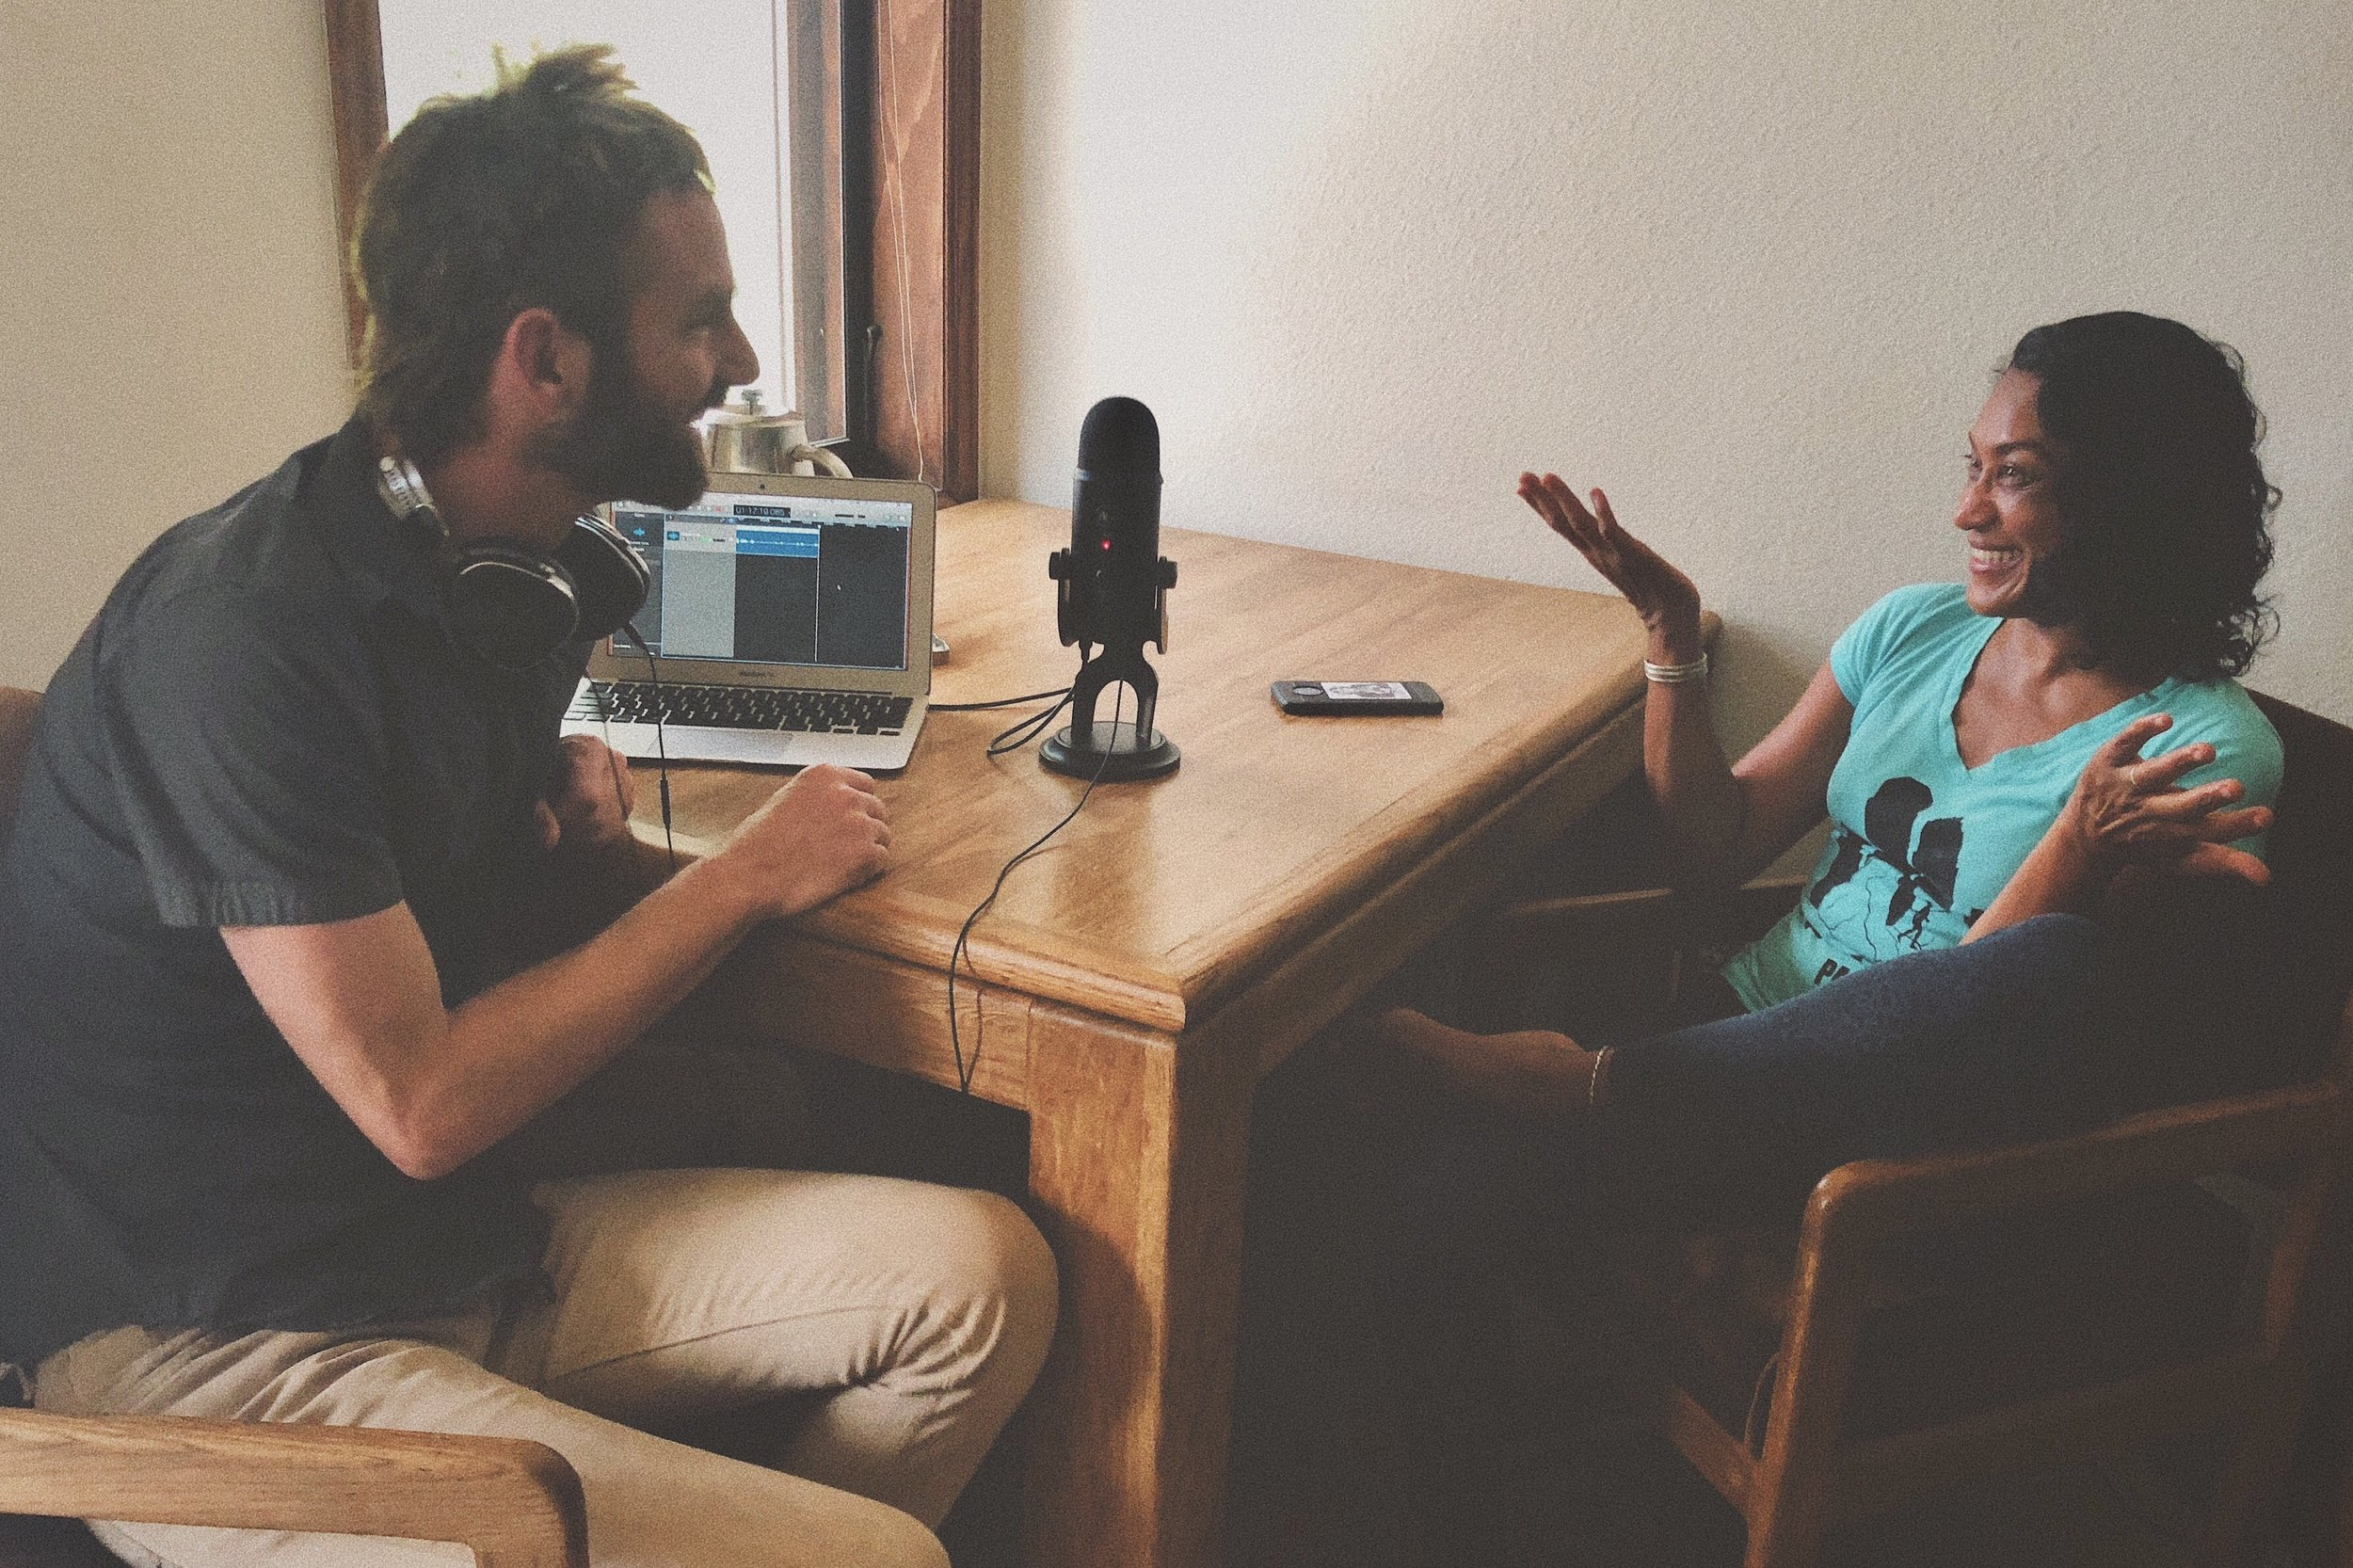 Podcast studio in Telluride